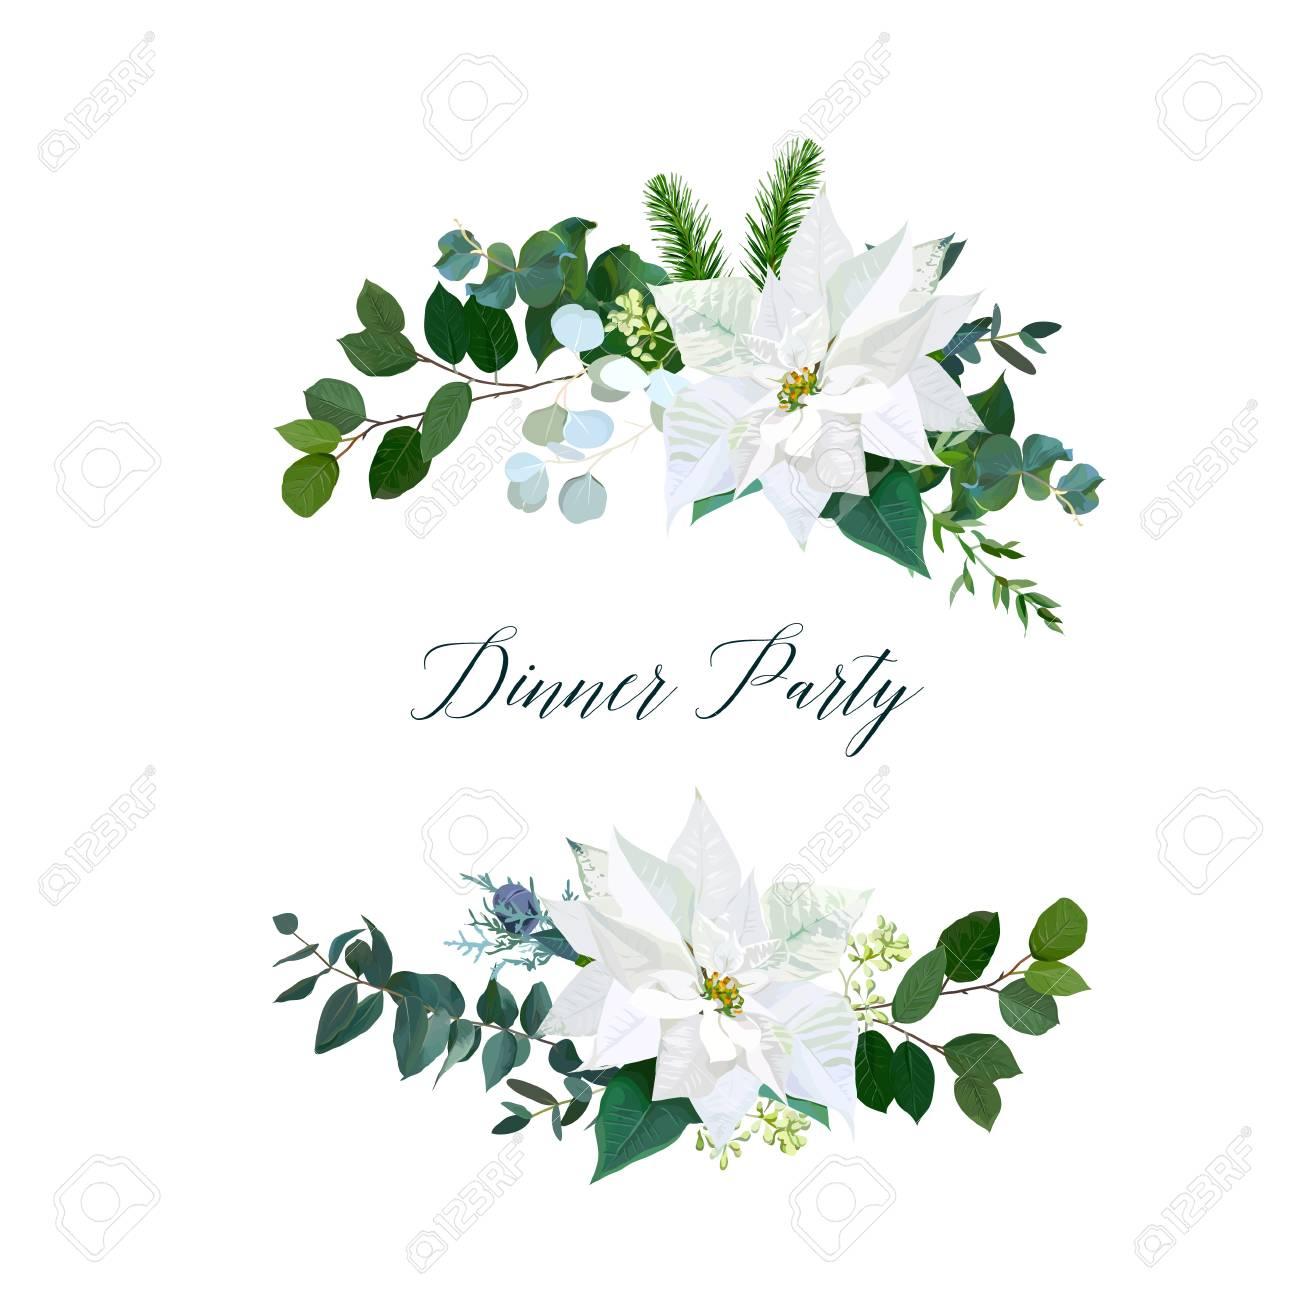 Christmas Greenery Vector.White Poinsettia Flowers Christmas Greenery Emerald Eucalyptus